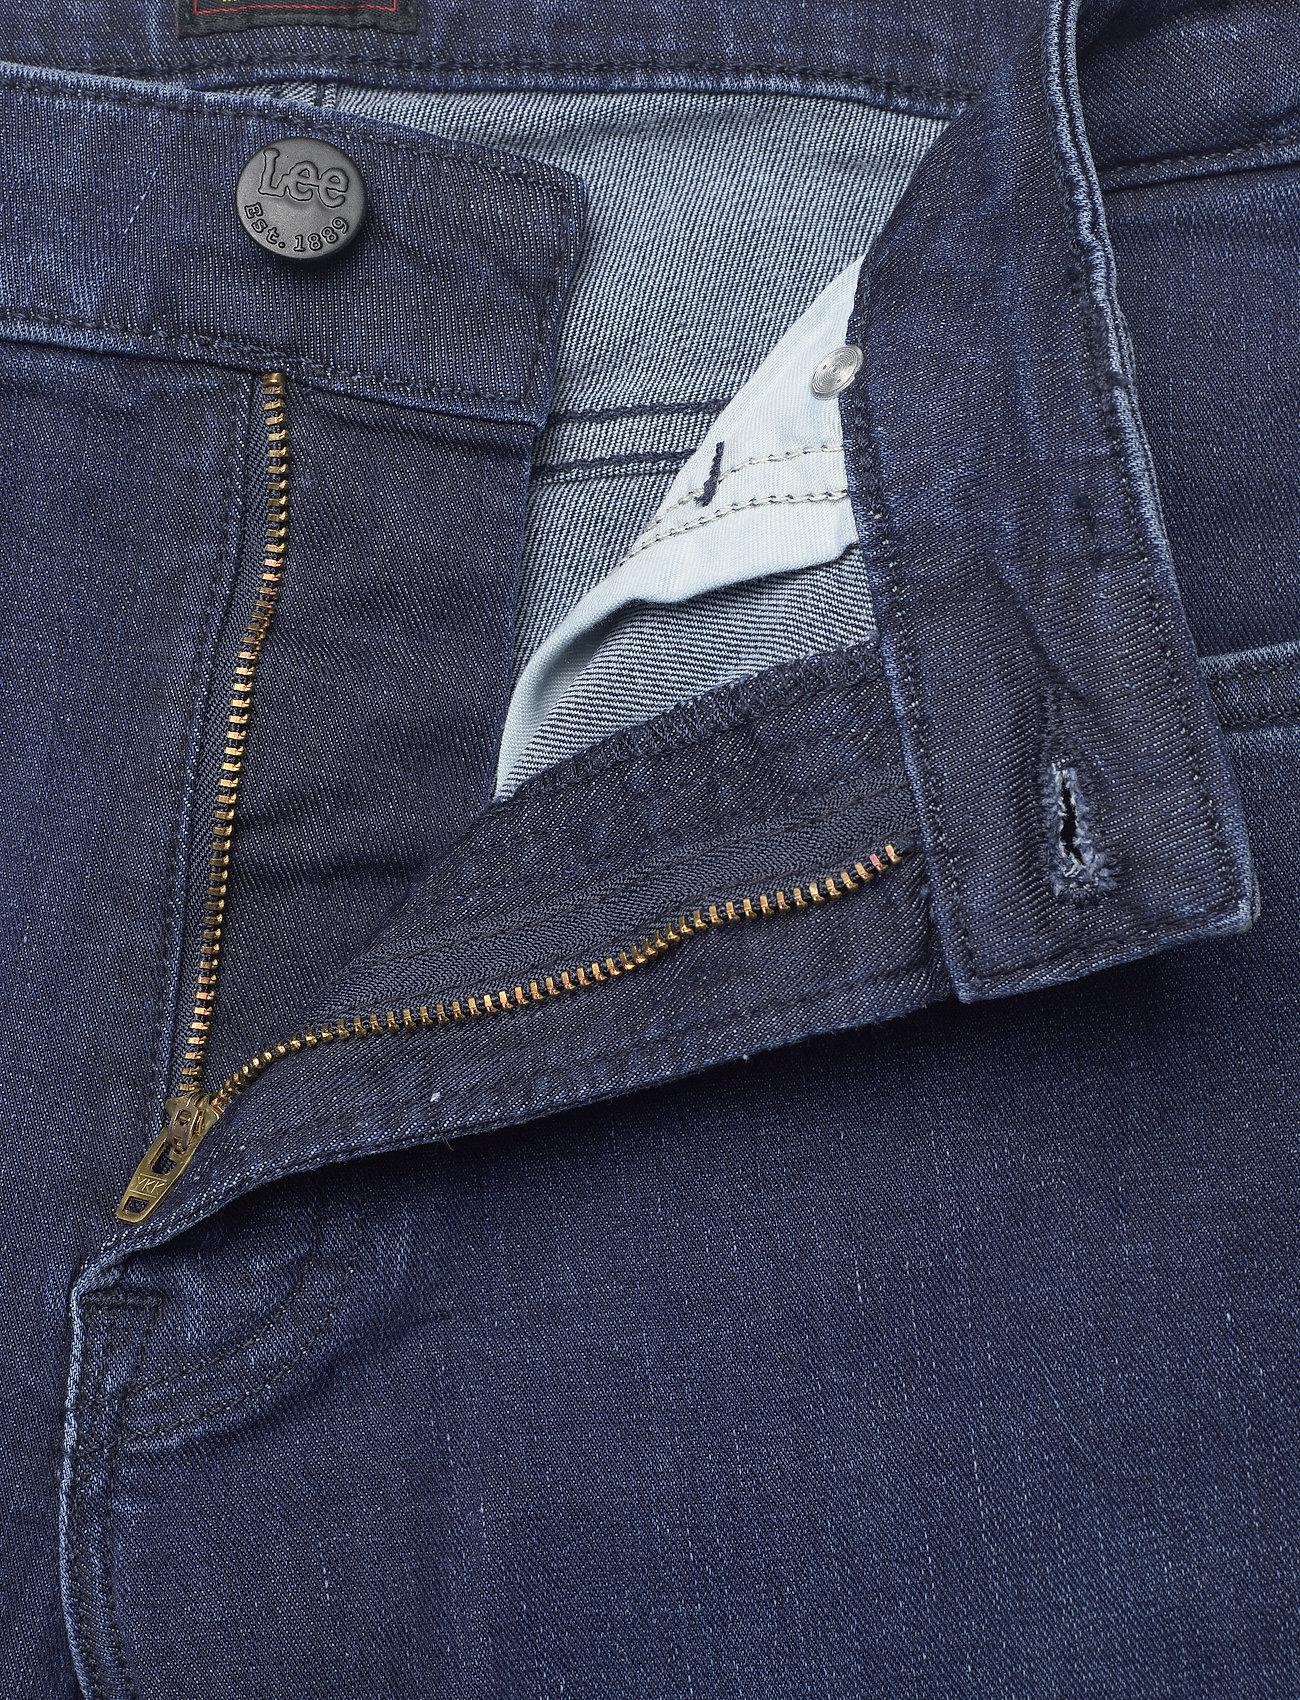 Lee Jeans - MALONE - skinny jeans - dark lonepine - 1